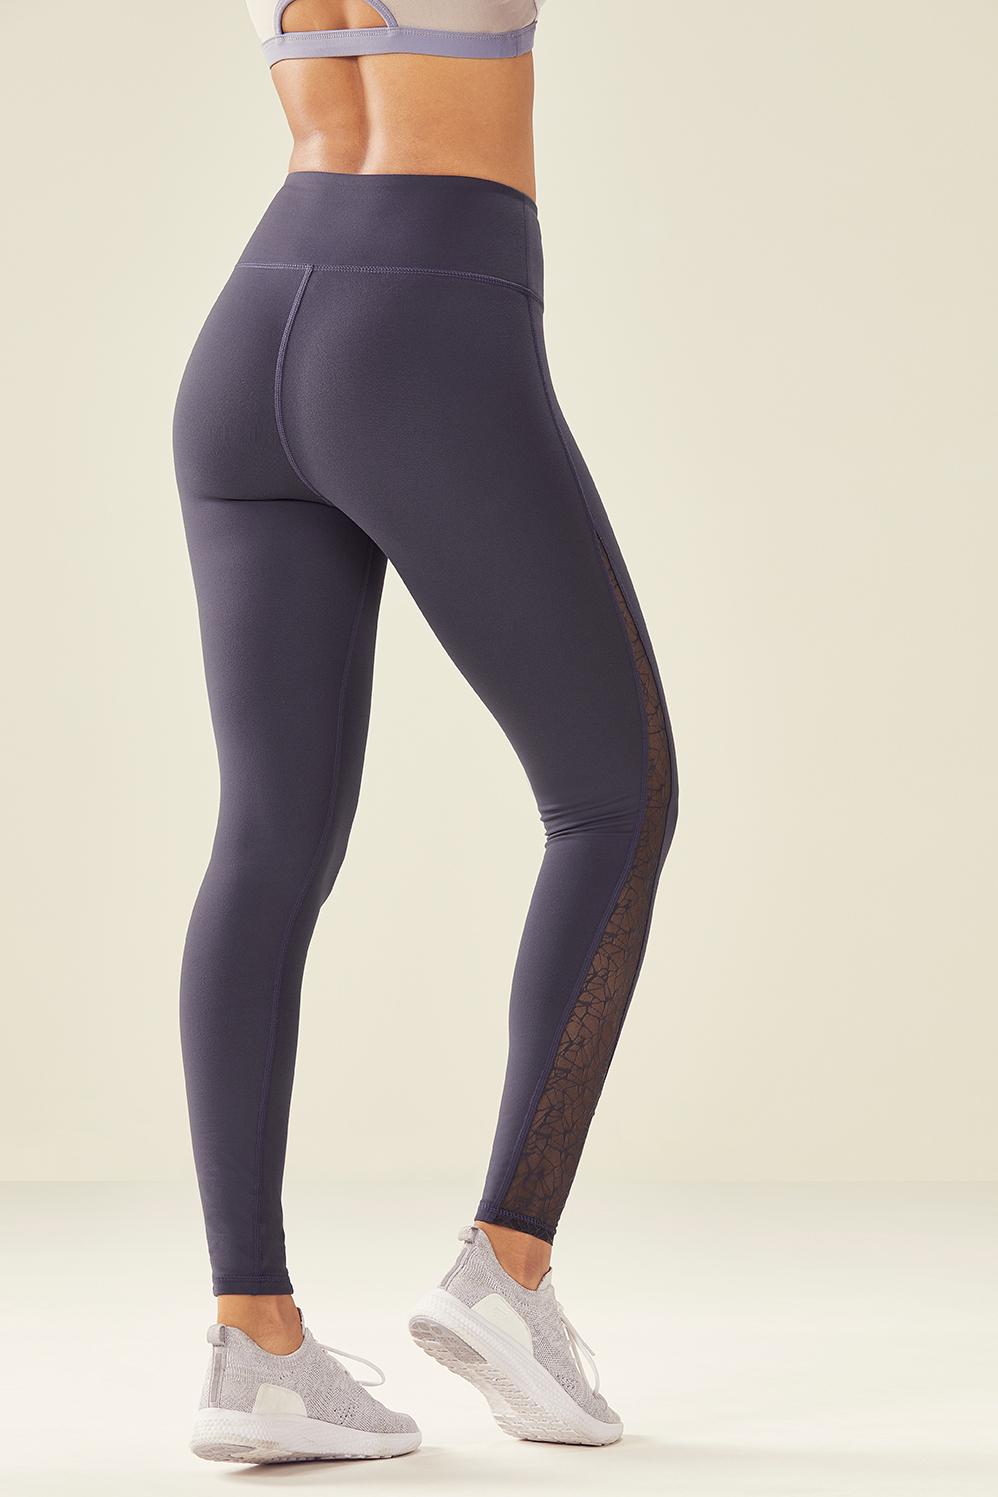 c422992933 Fabletics Tight High-Waisted Mesh Powerhold Legging Womens Gray Size XXS